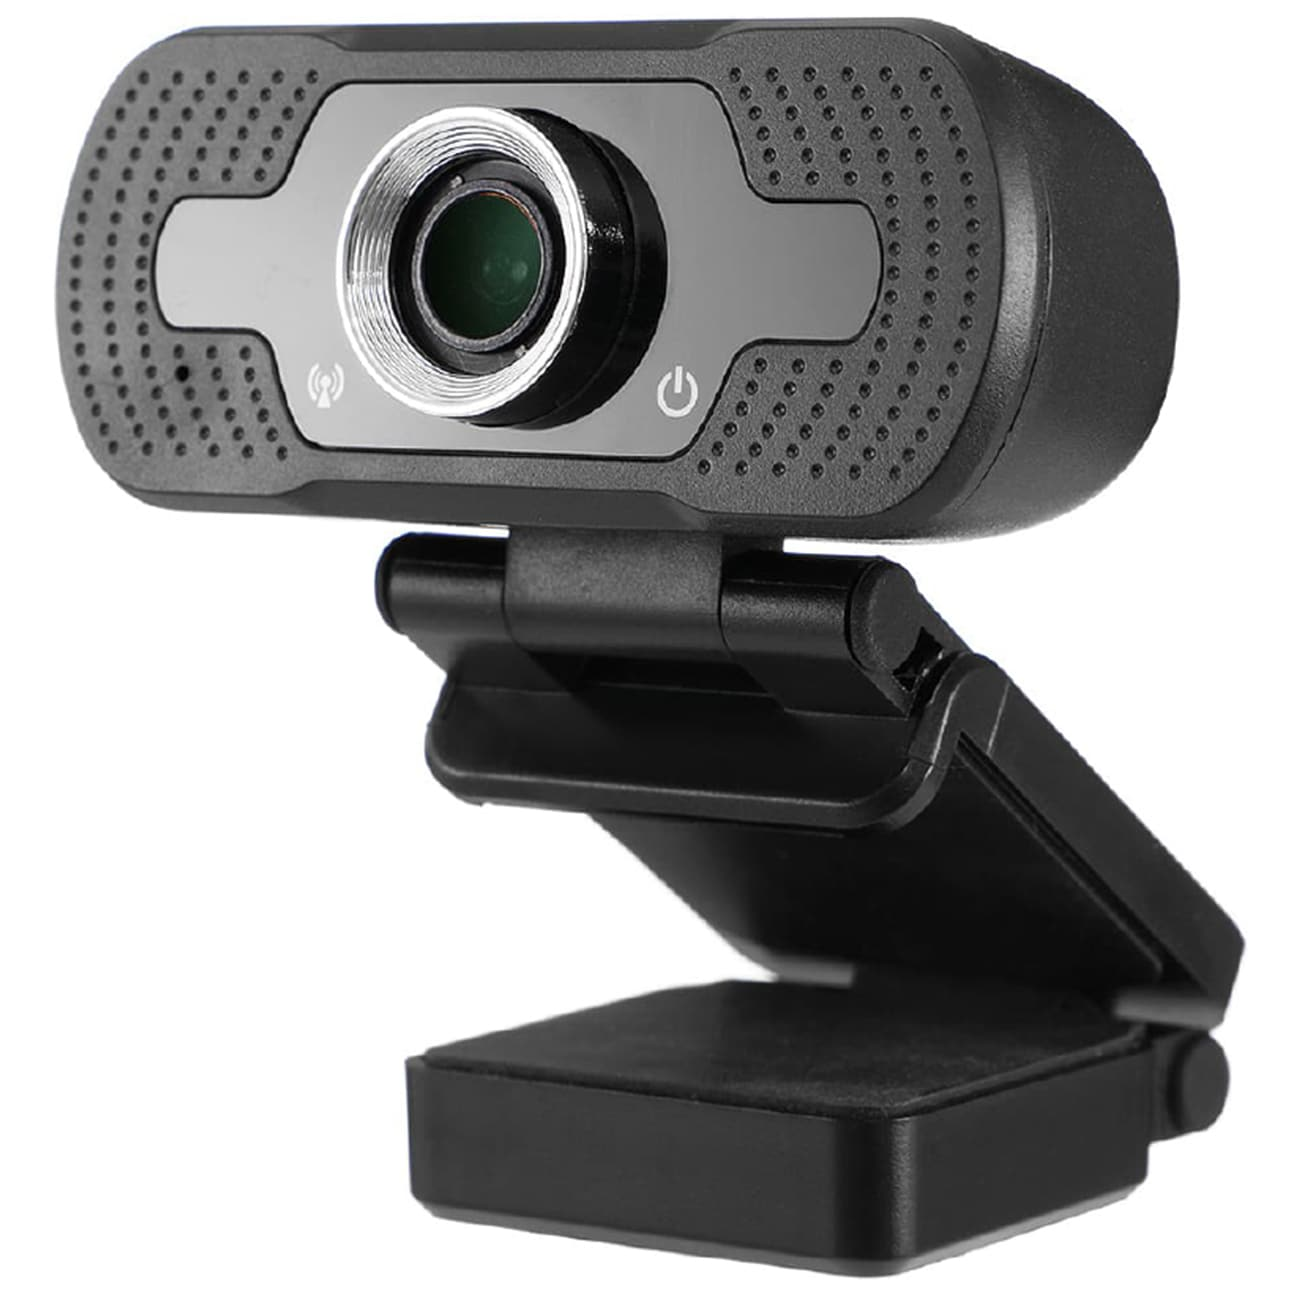 Webcam for Streaming Microphone Camera USB FHD SP-WCAM01 - 5